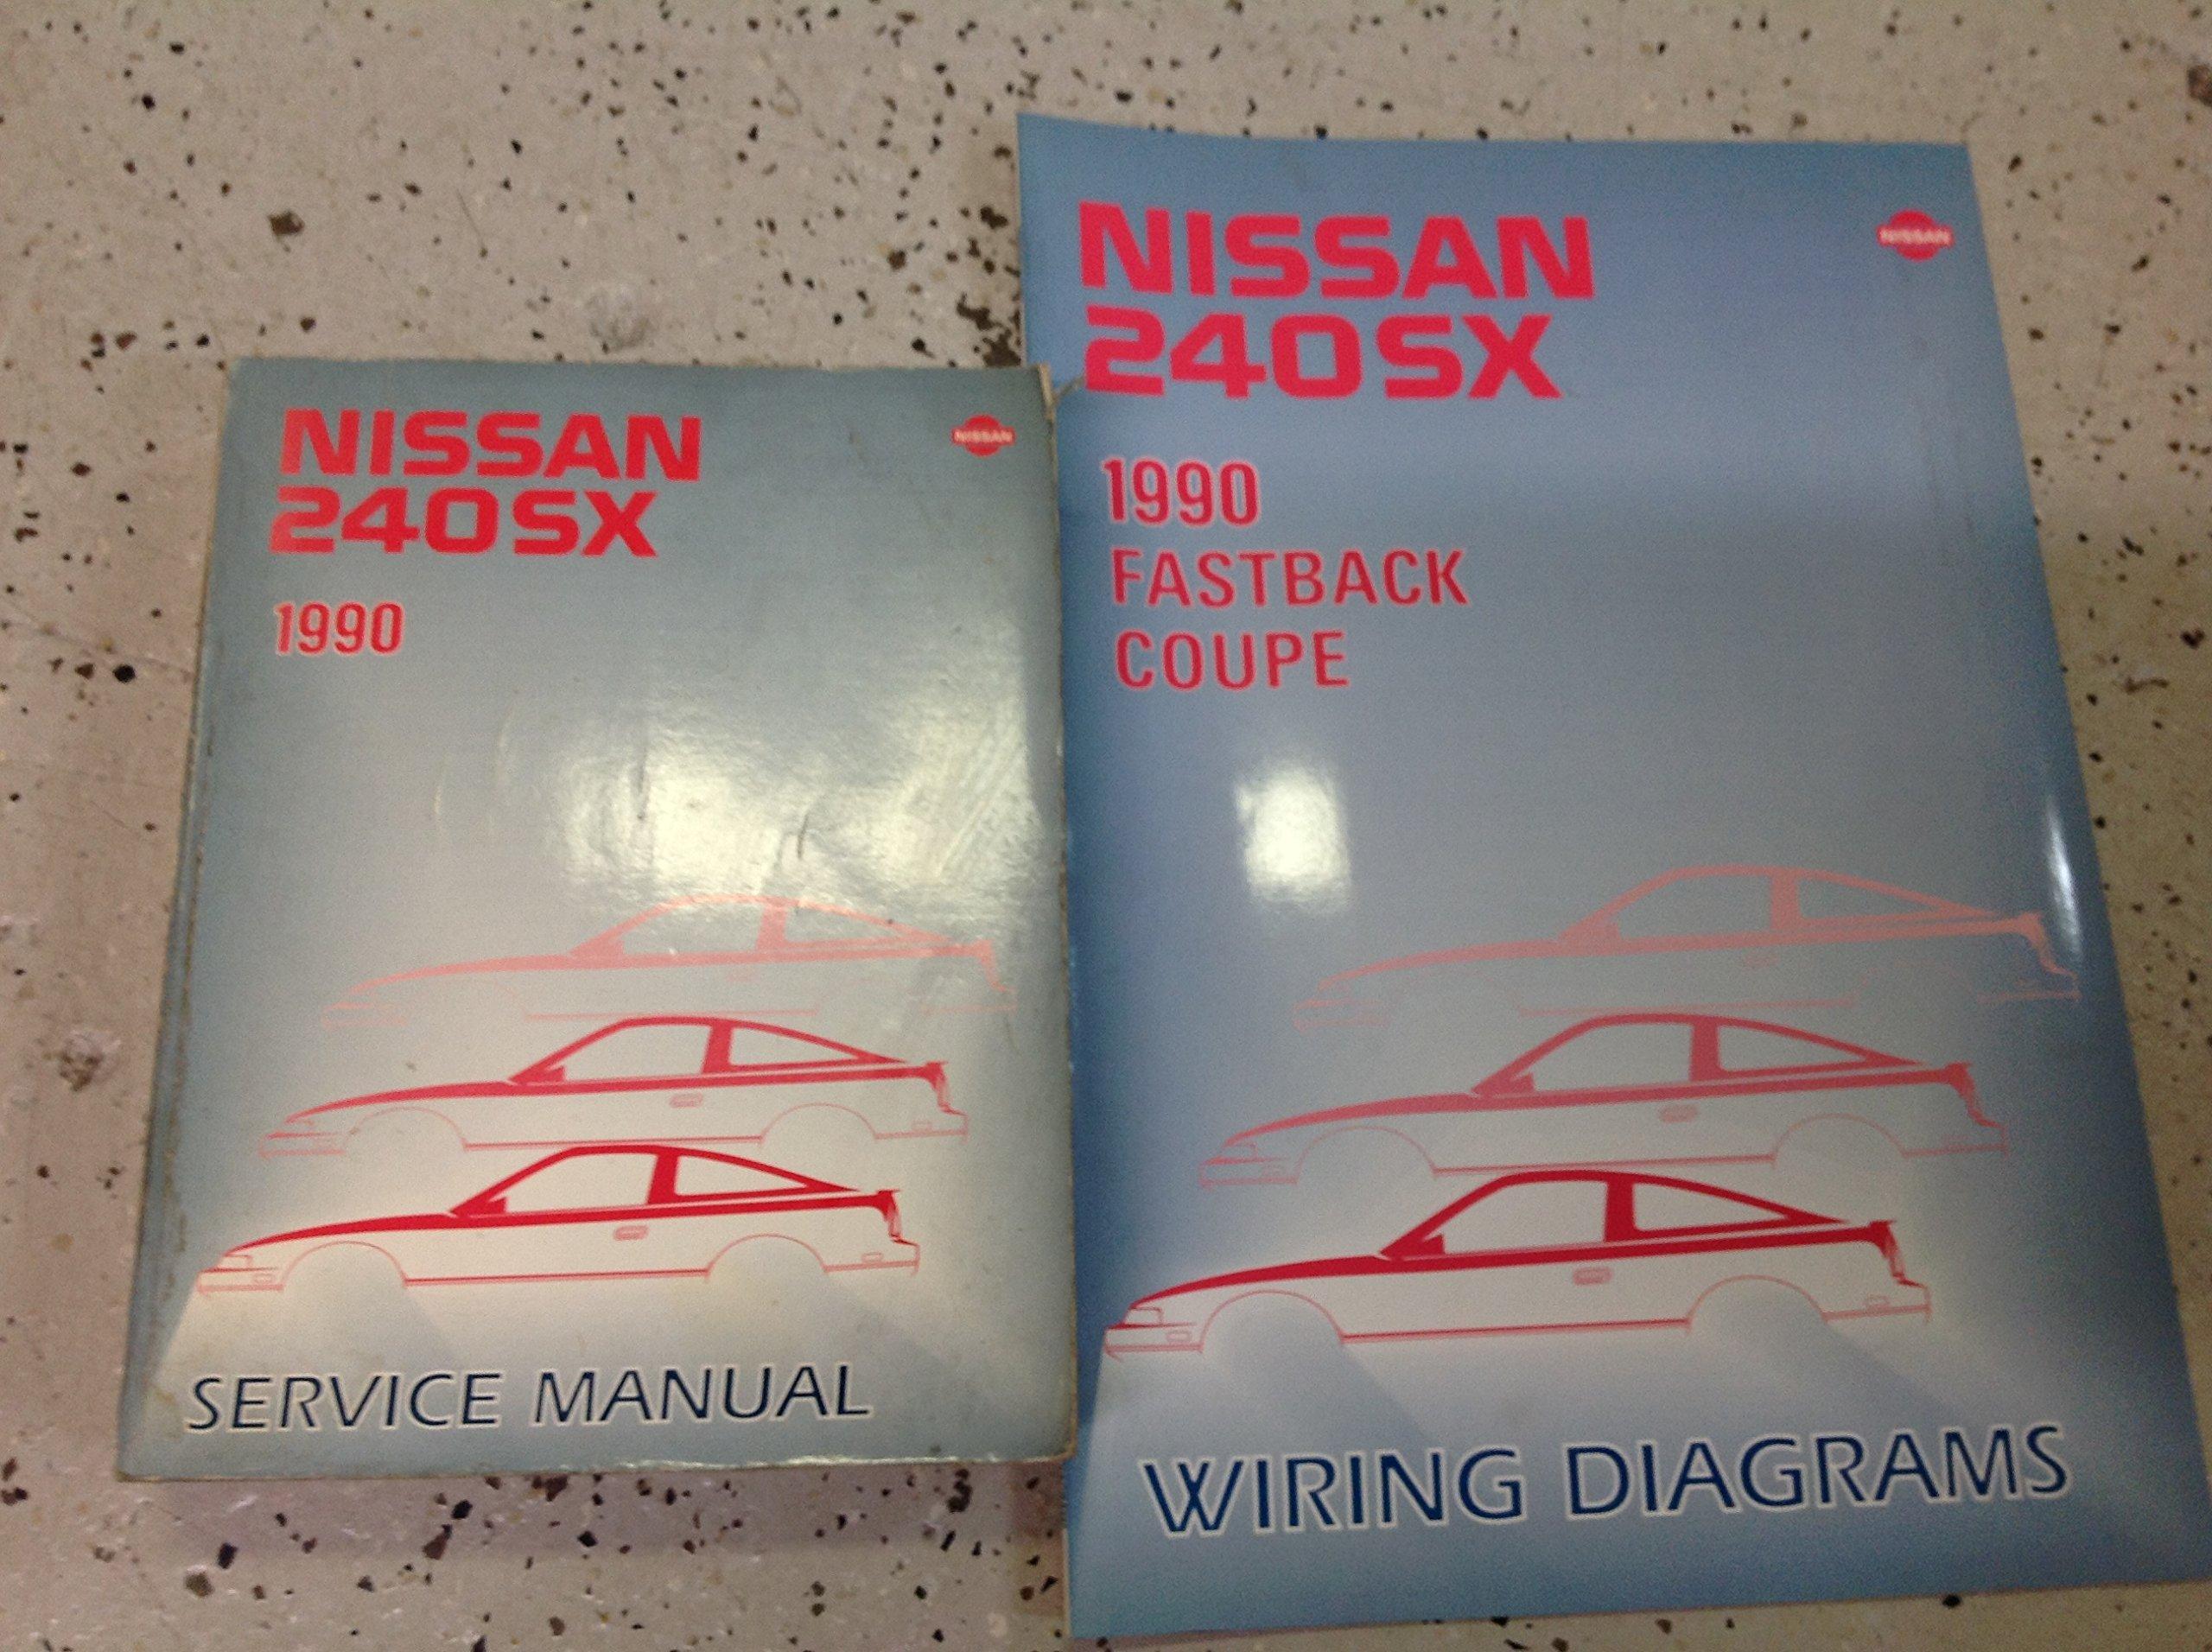 1990 nissan 240sx service repair shop manual factory oem w electrical wiring  ewd paperback – 1990